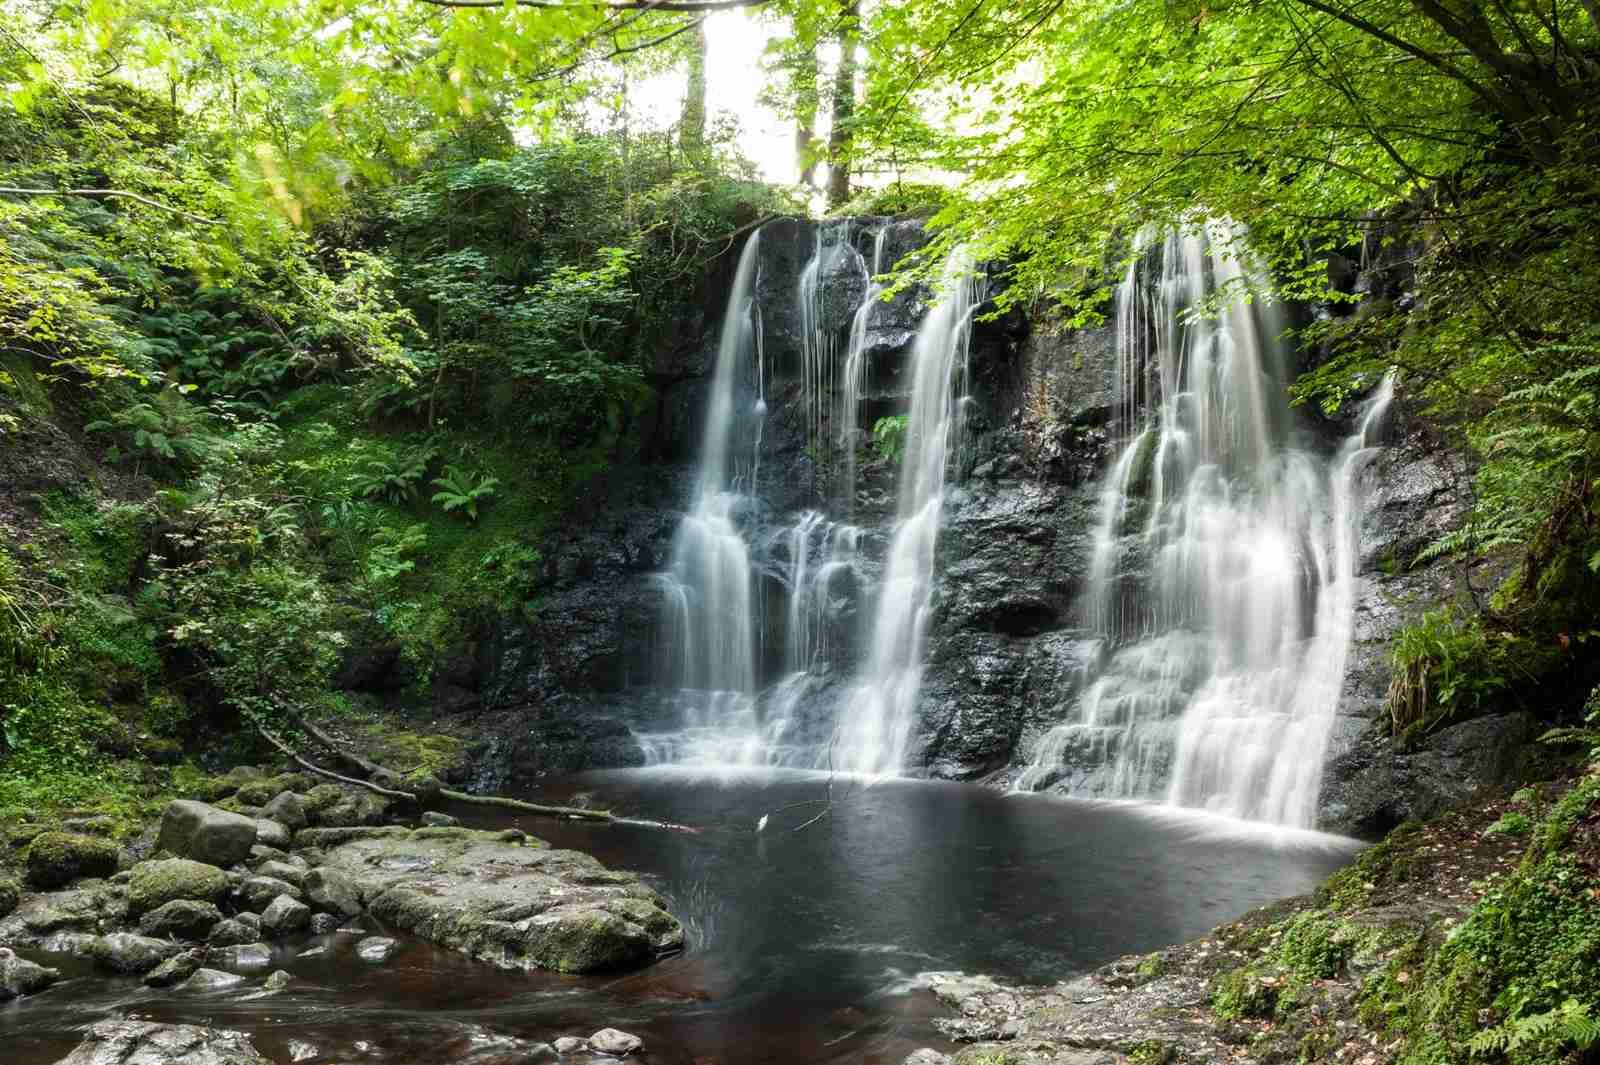 Glenariff Forest Park in Northern Ireland. (Photo by Nicola Ferrari/Getty Images)